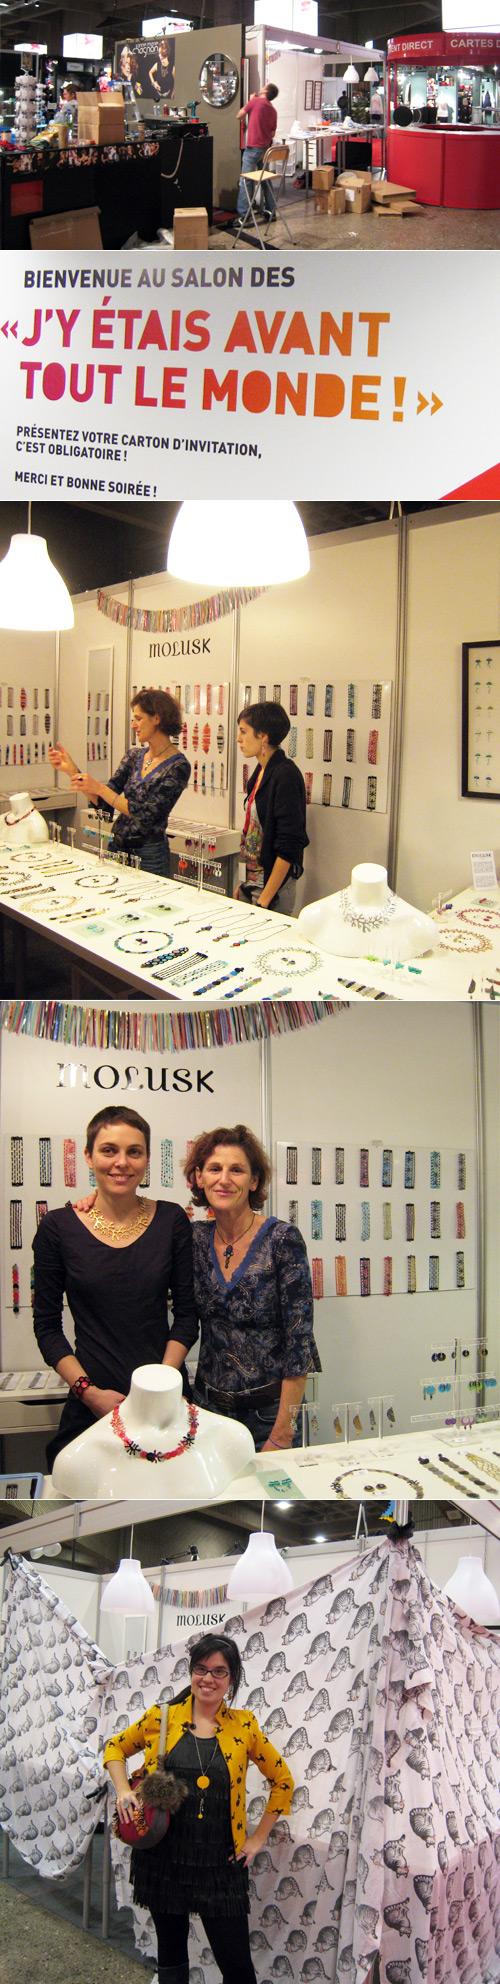 Inauguration SMAQ 2010